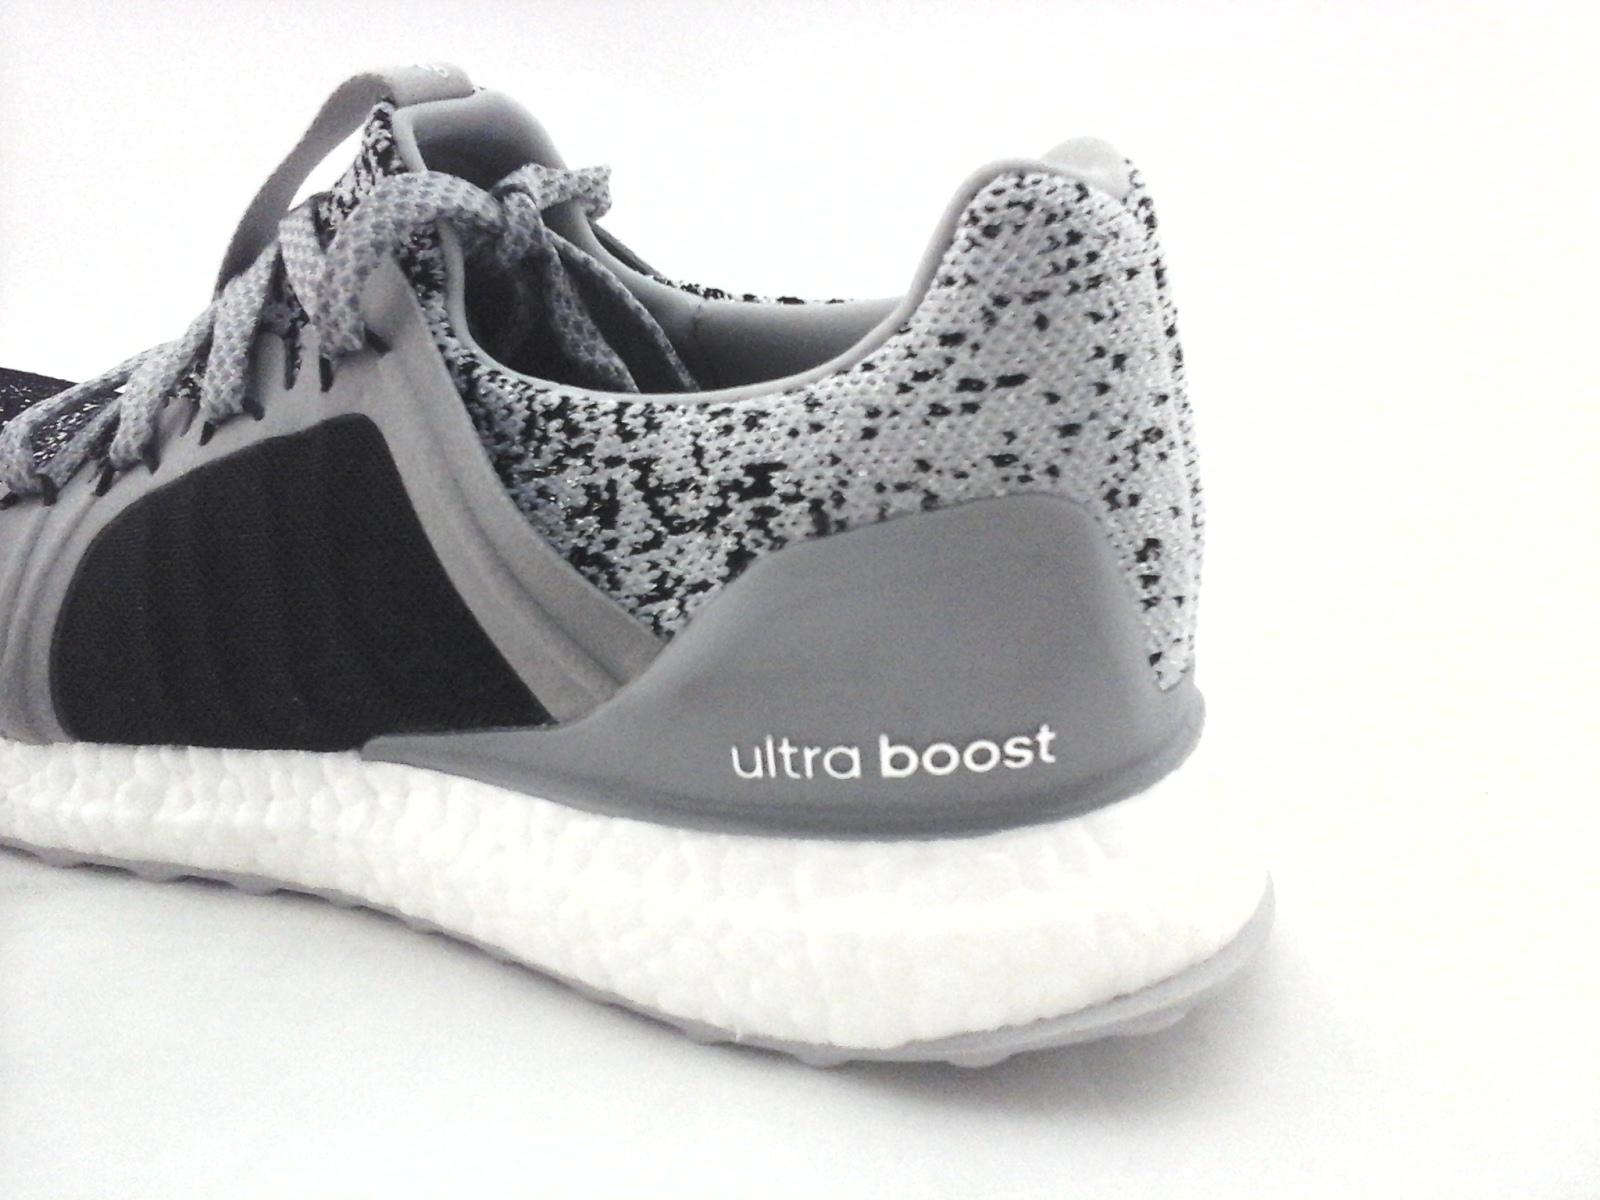 7eb8c4e09b67c Adidas STELLA MCCARTNEY UltraBoost Shoes S80846 Black Sparkle US 10.5 EU 43  1 3